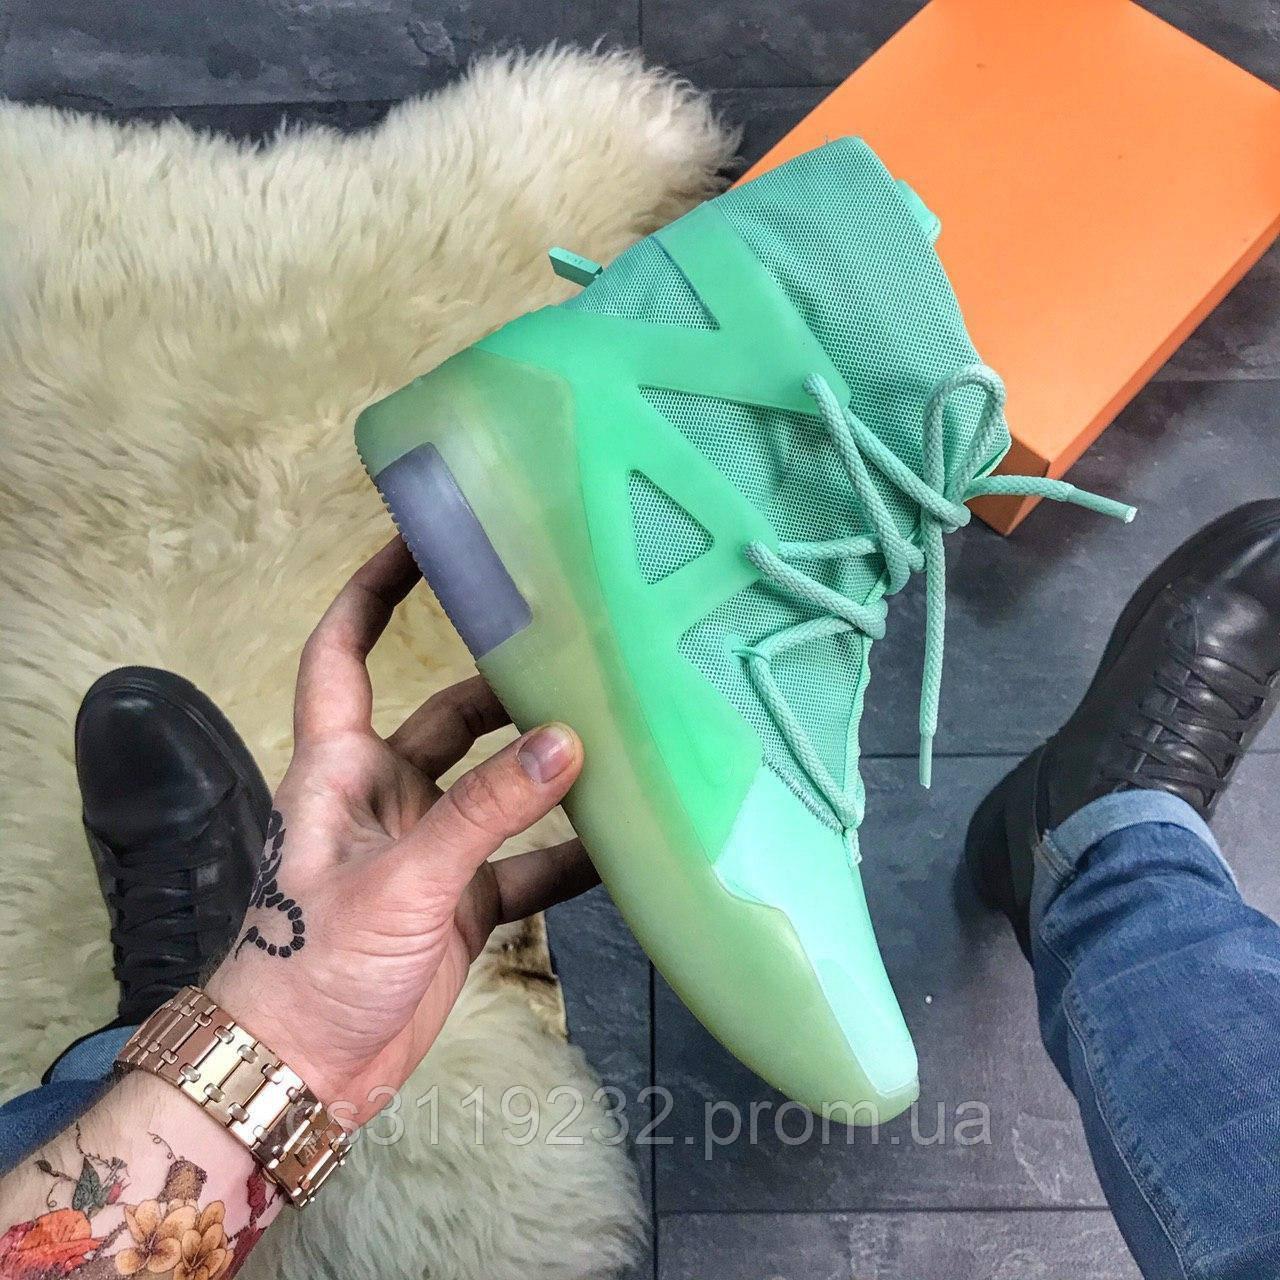 Чоловічі кросівки Nike Air Fear Of God Frosted Spruce (зелені)